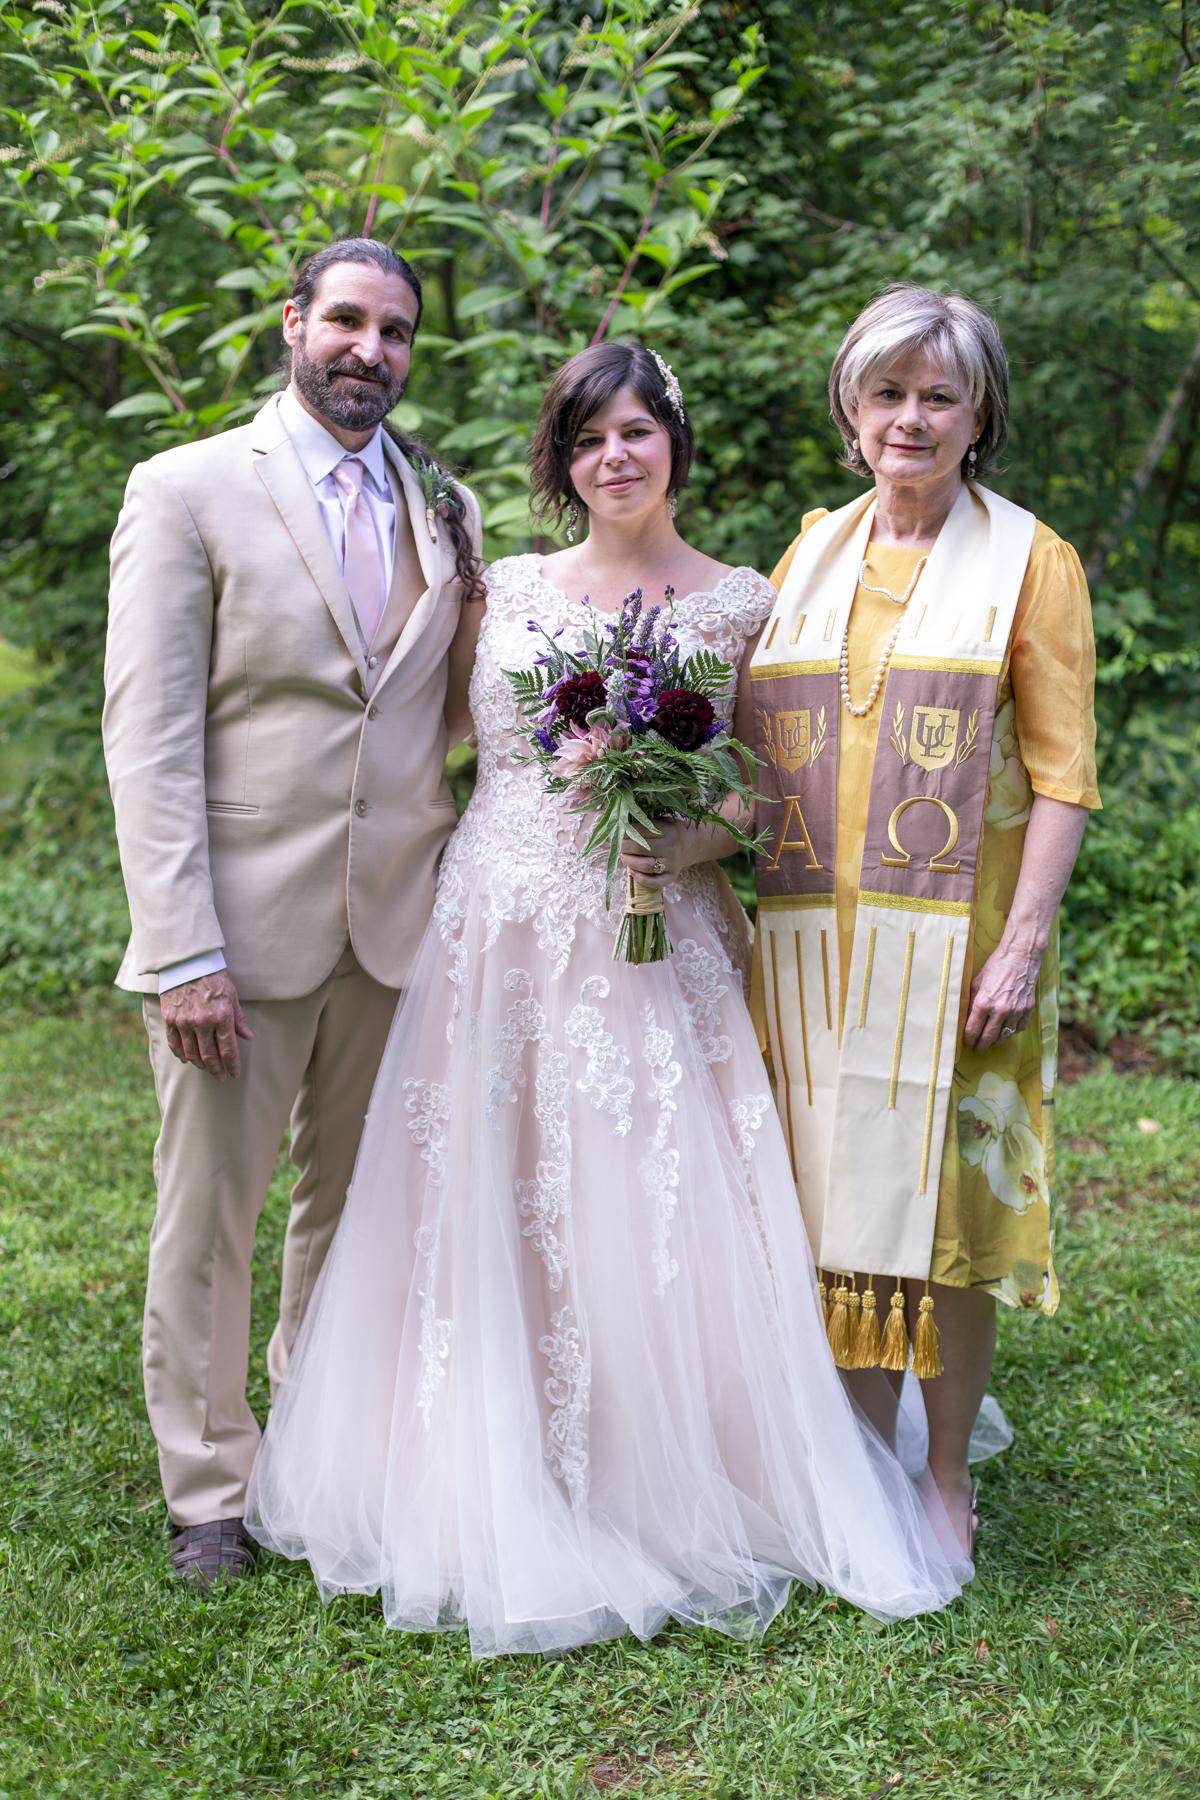 Avyanna and Phoenix Wedding 2019_photos by Studio Misha_BLOG-104.jpg